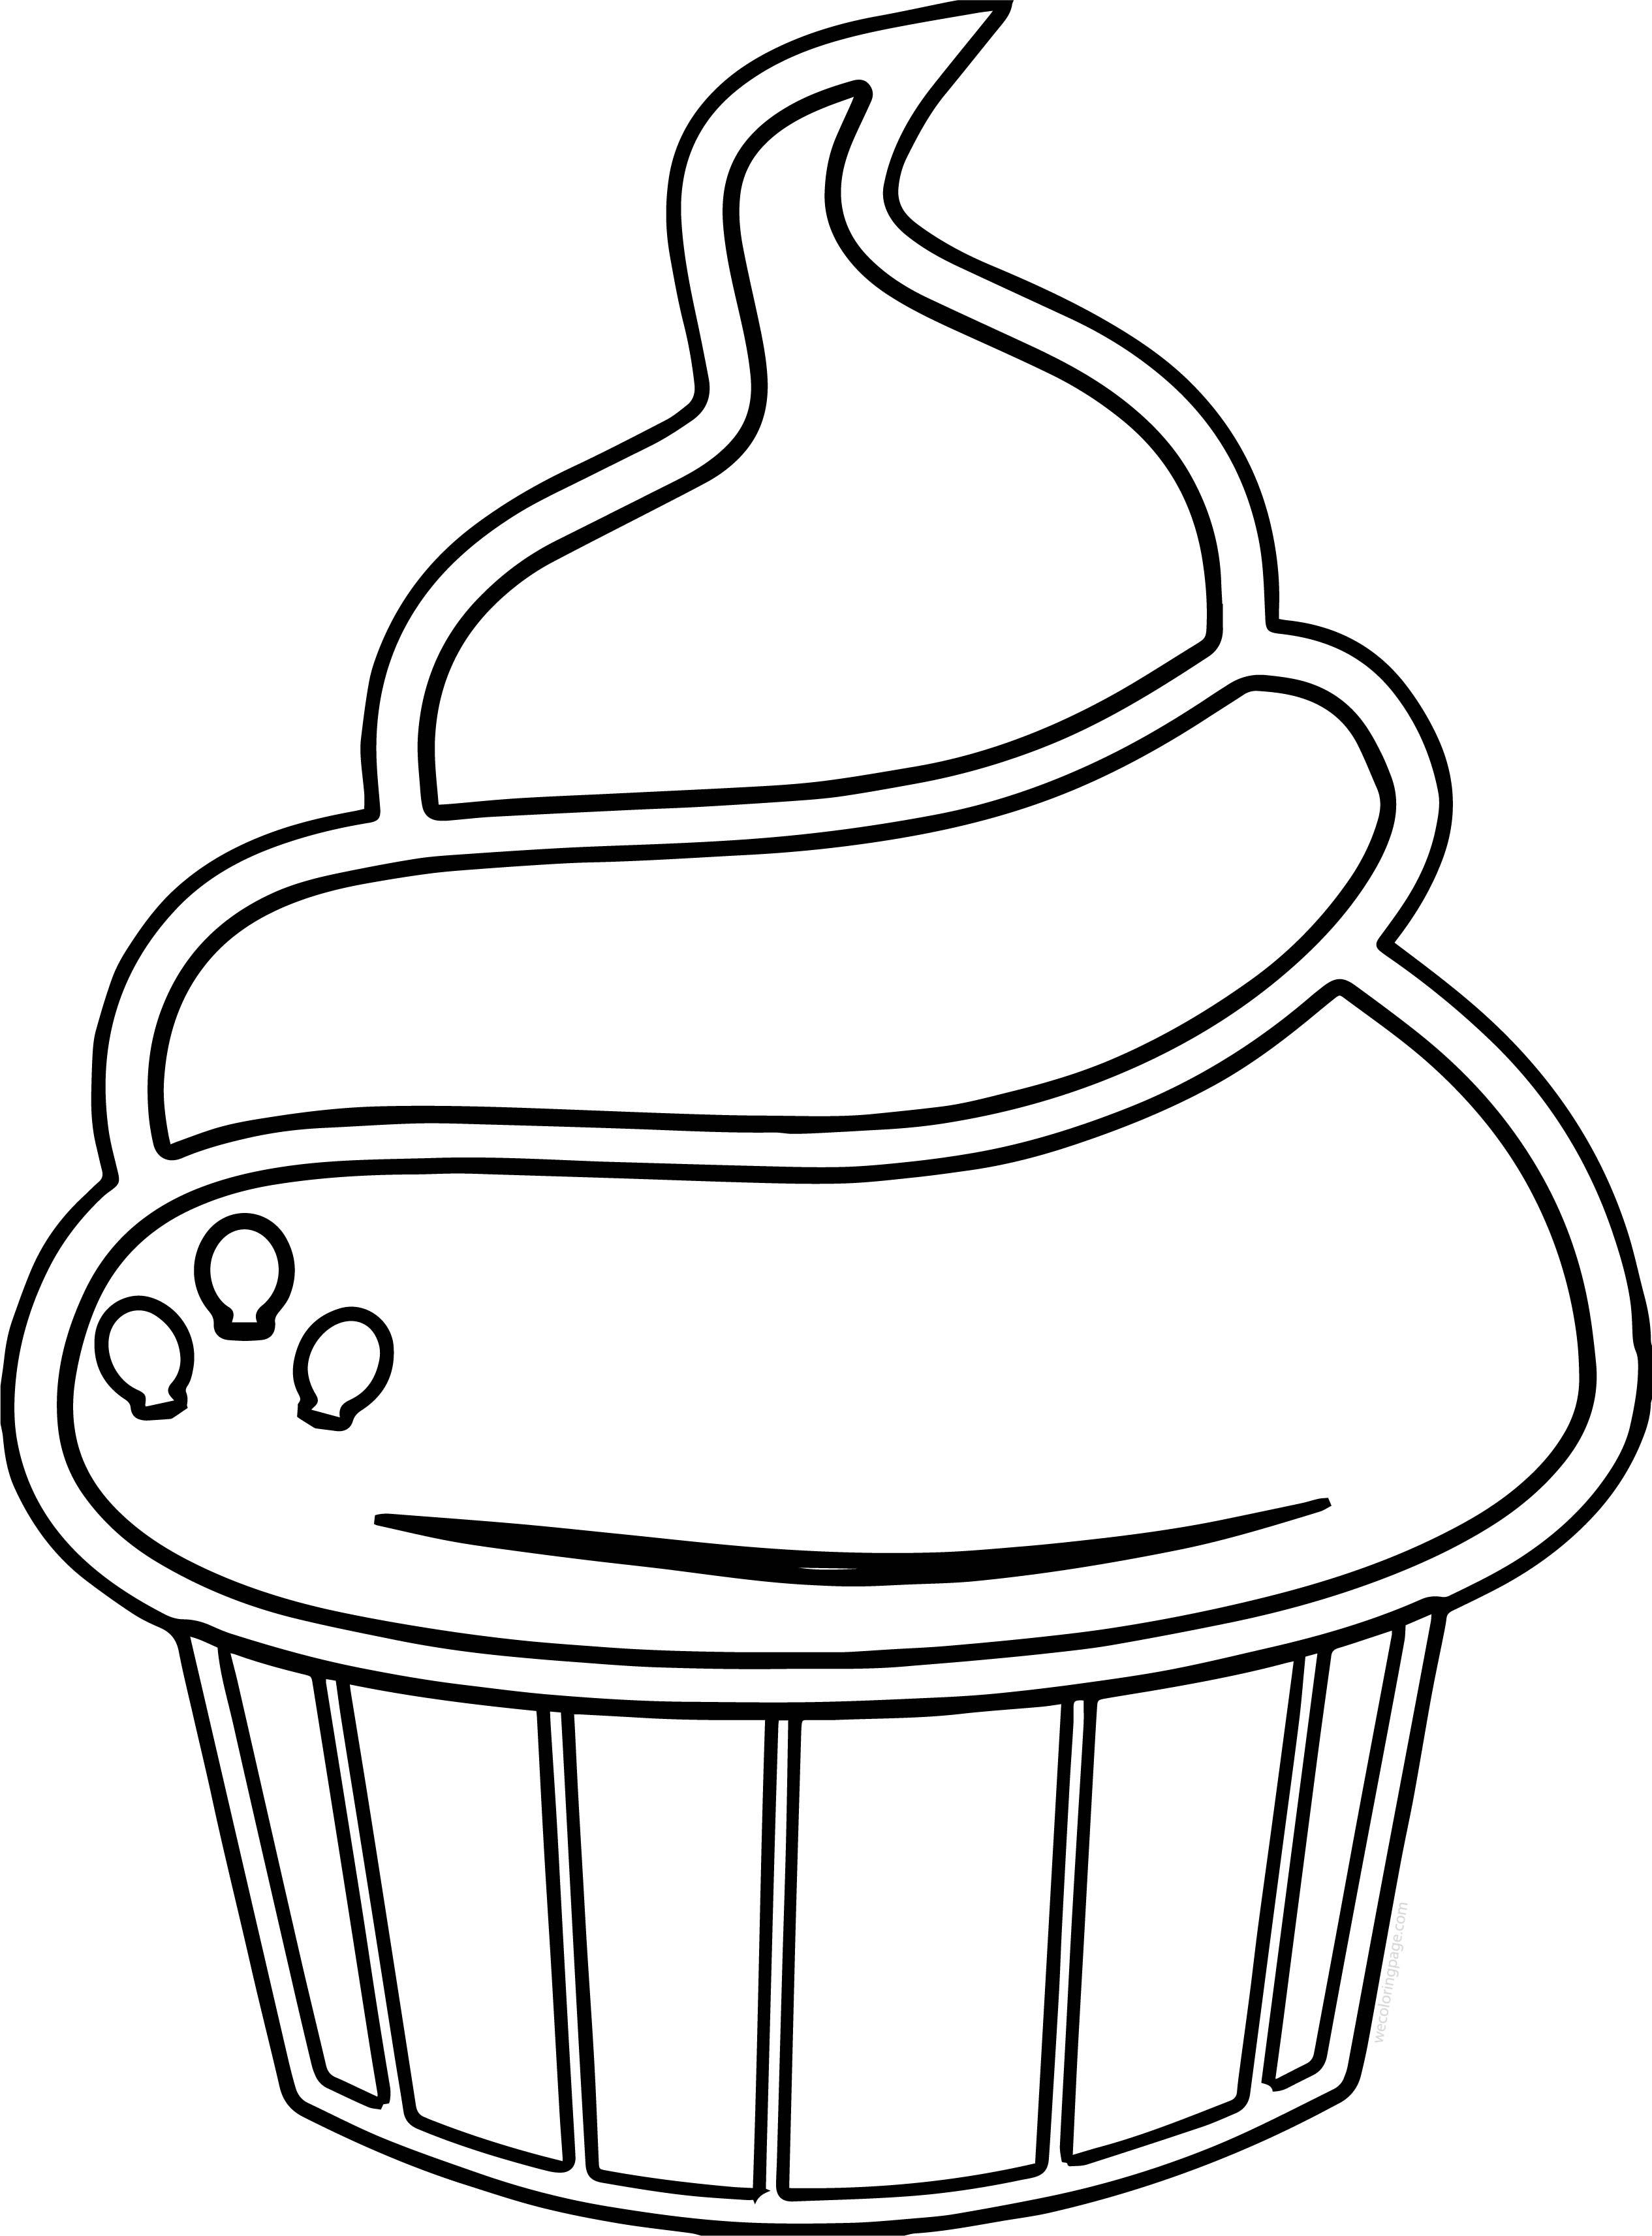 Pinkie Pie Cupcake We Coloring Page